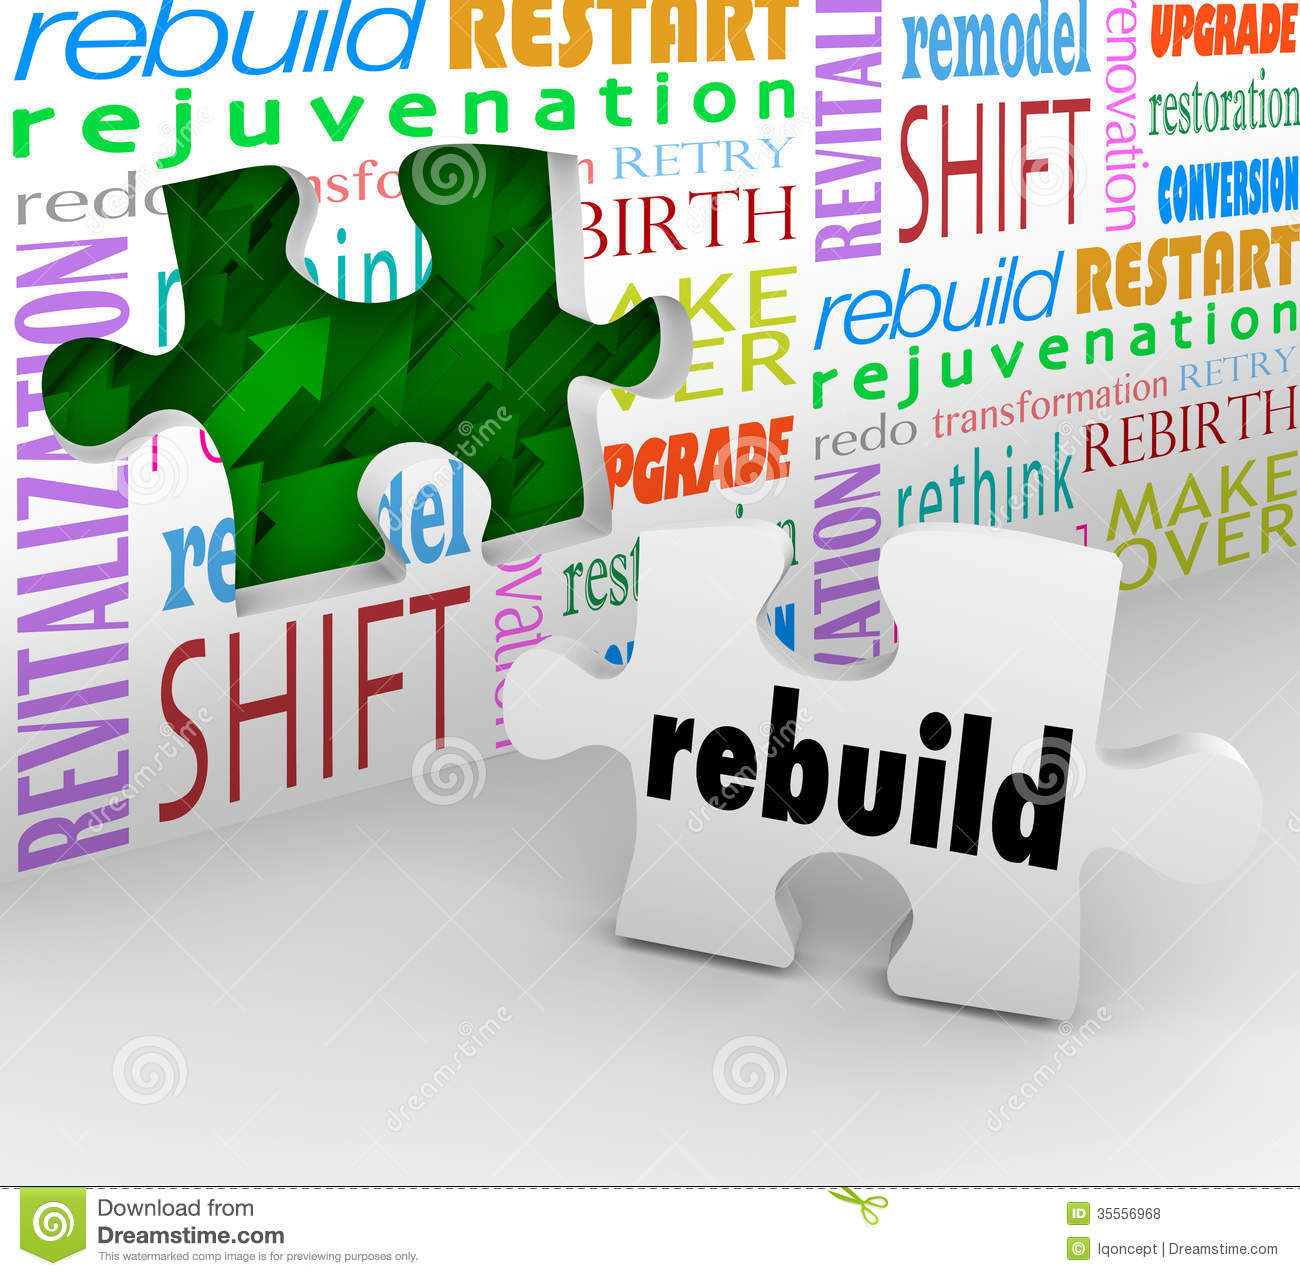 Rebuild clipart.